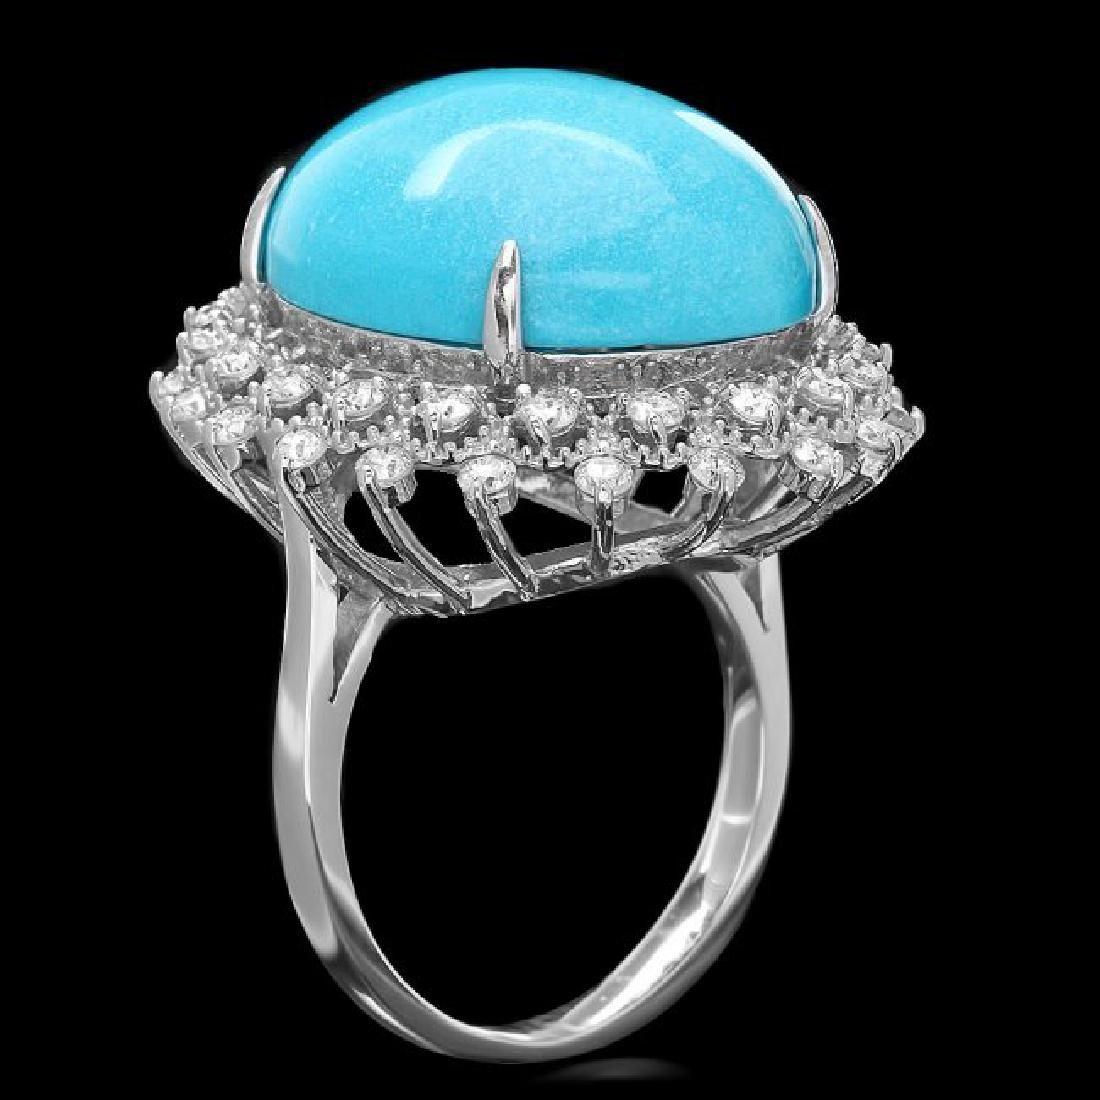 14k Gold 18.50ct Turquoise 1.00ct Diamond Ring - 2